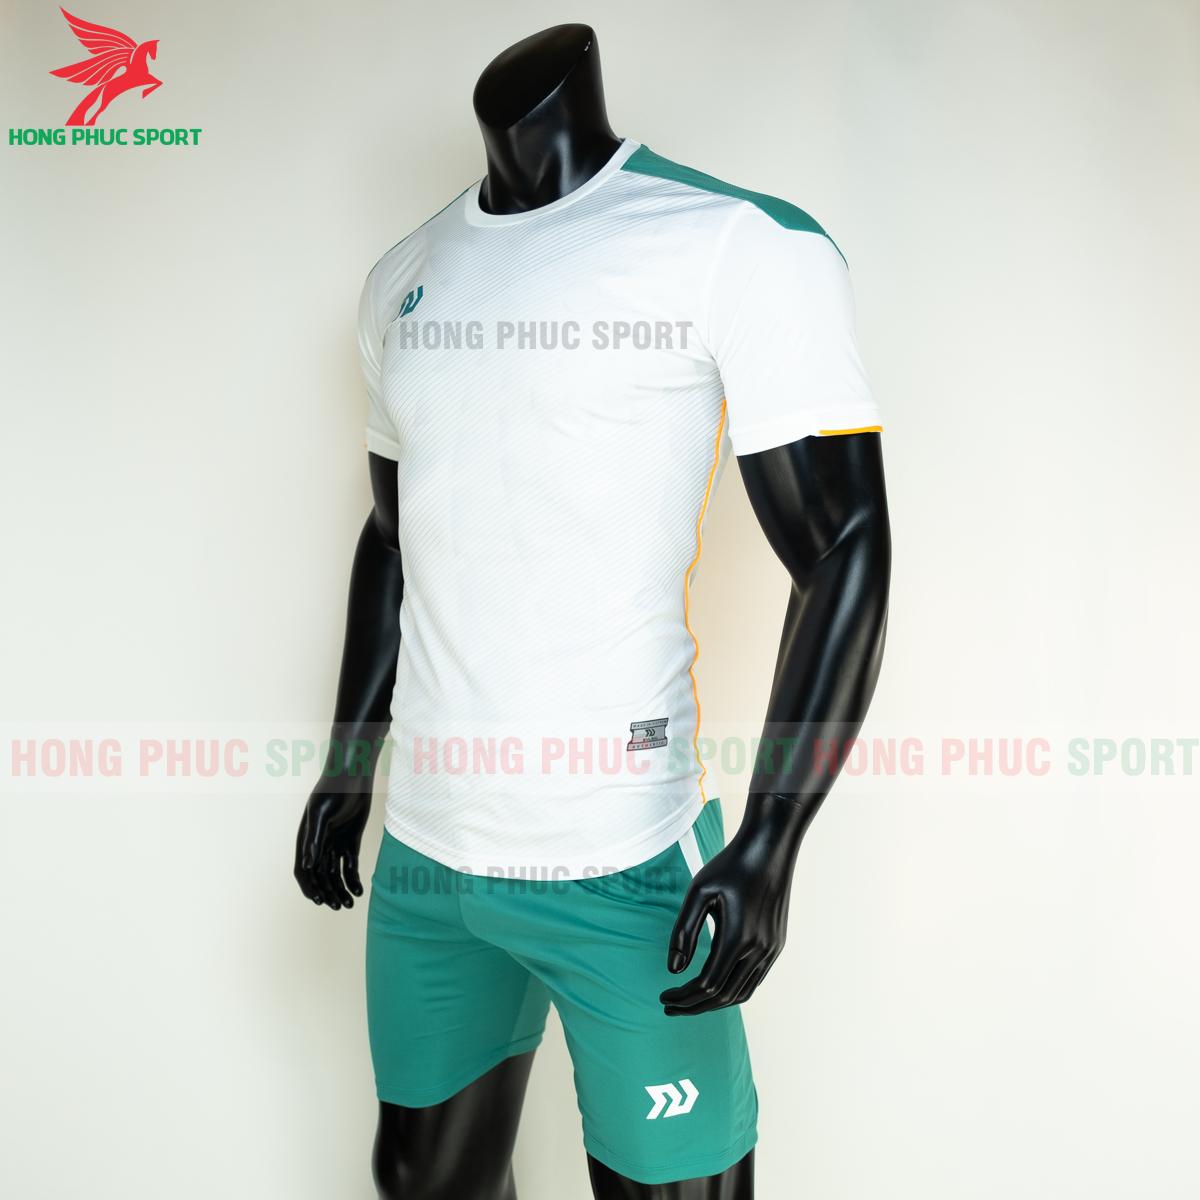 https://cdn.hongphucsport.com/unsafe/s4.shopbay.vn/files/285/ao-bong-da-khong-logo-bulbal-lotus-mau-trang-6-604f3ab7de76e.png